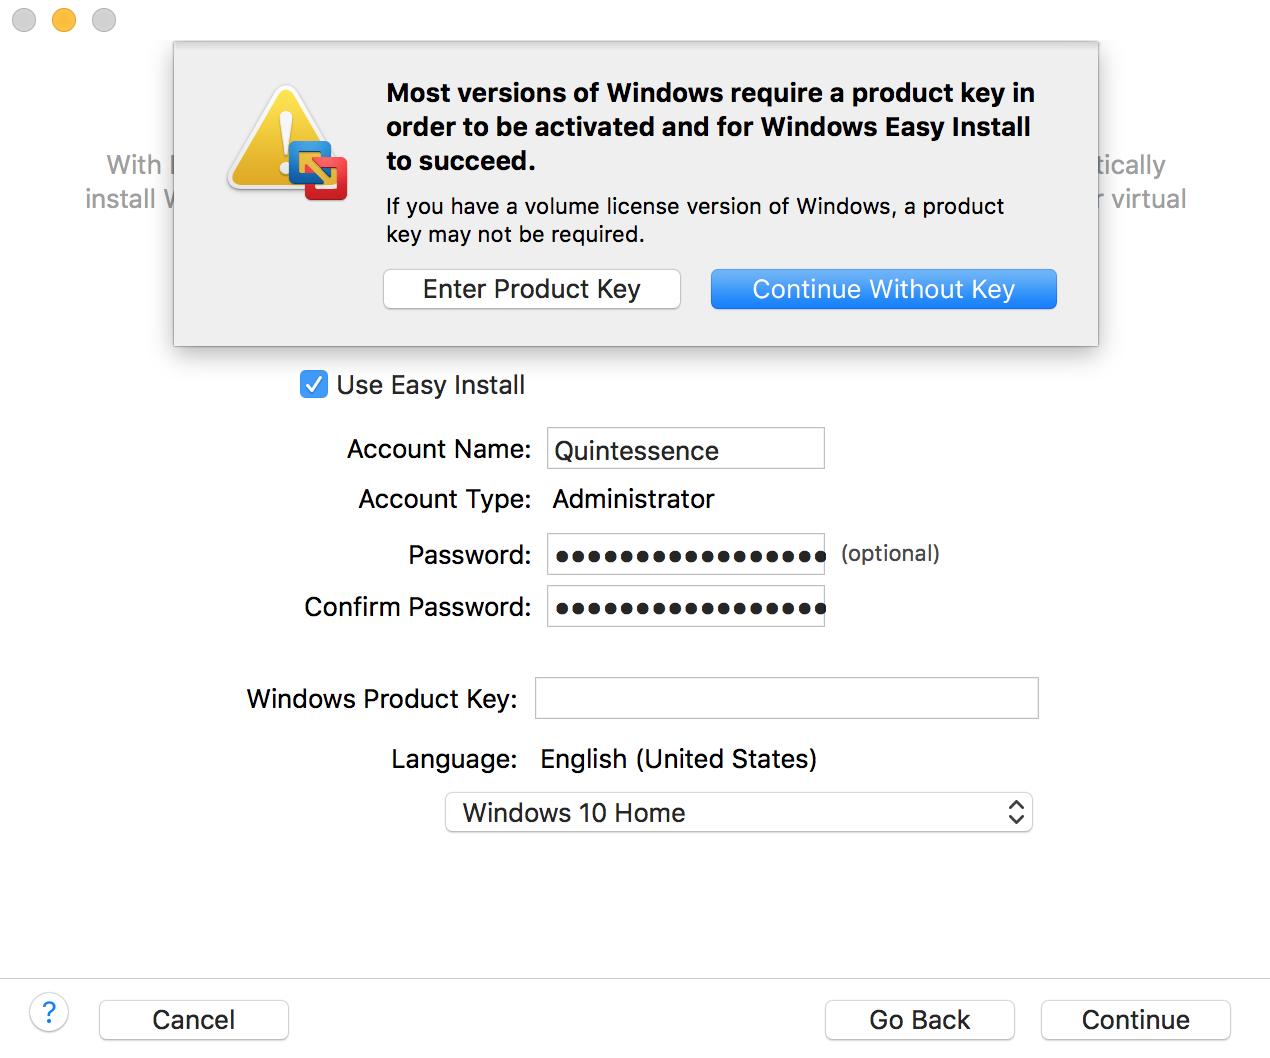 macOS 10, Windows 10, and VMWare Fusion 10